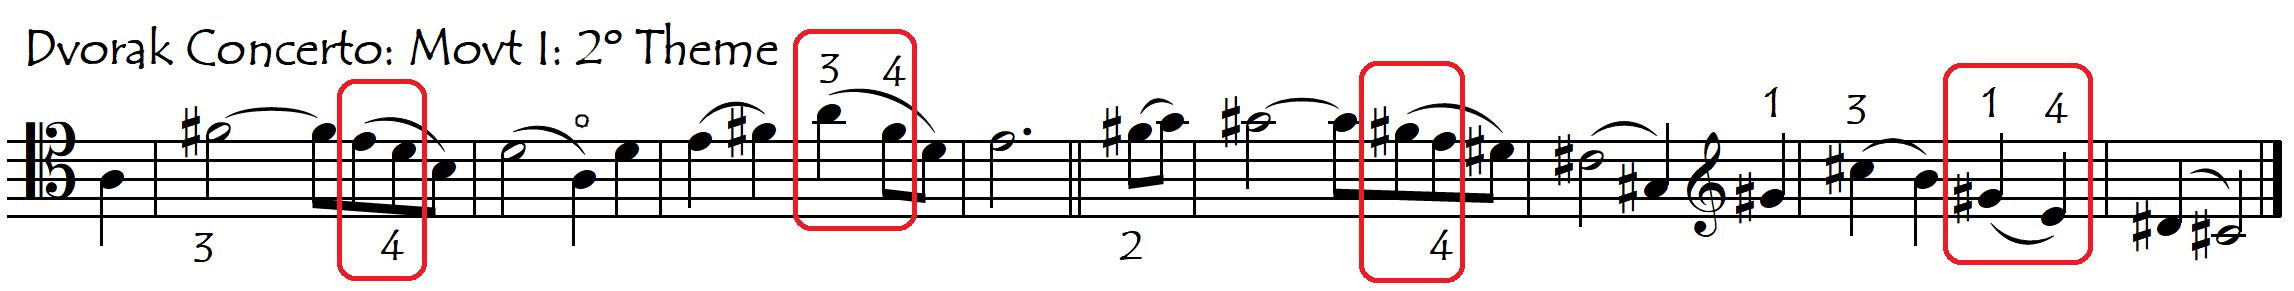 smooth downward scalic dvorak I with highlights